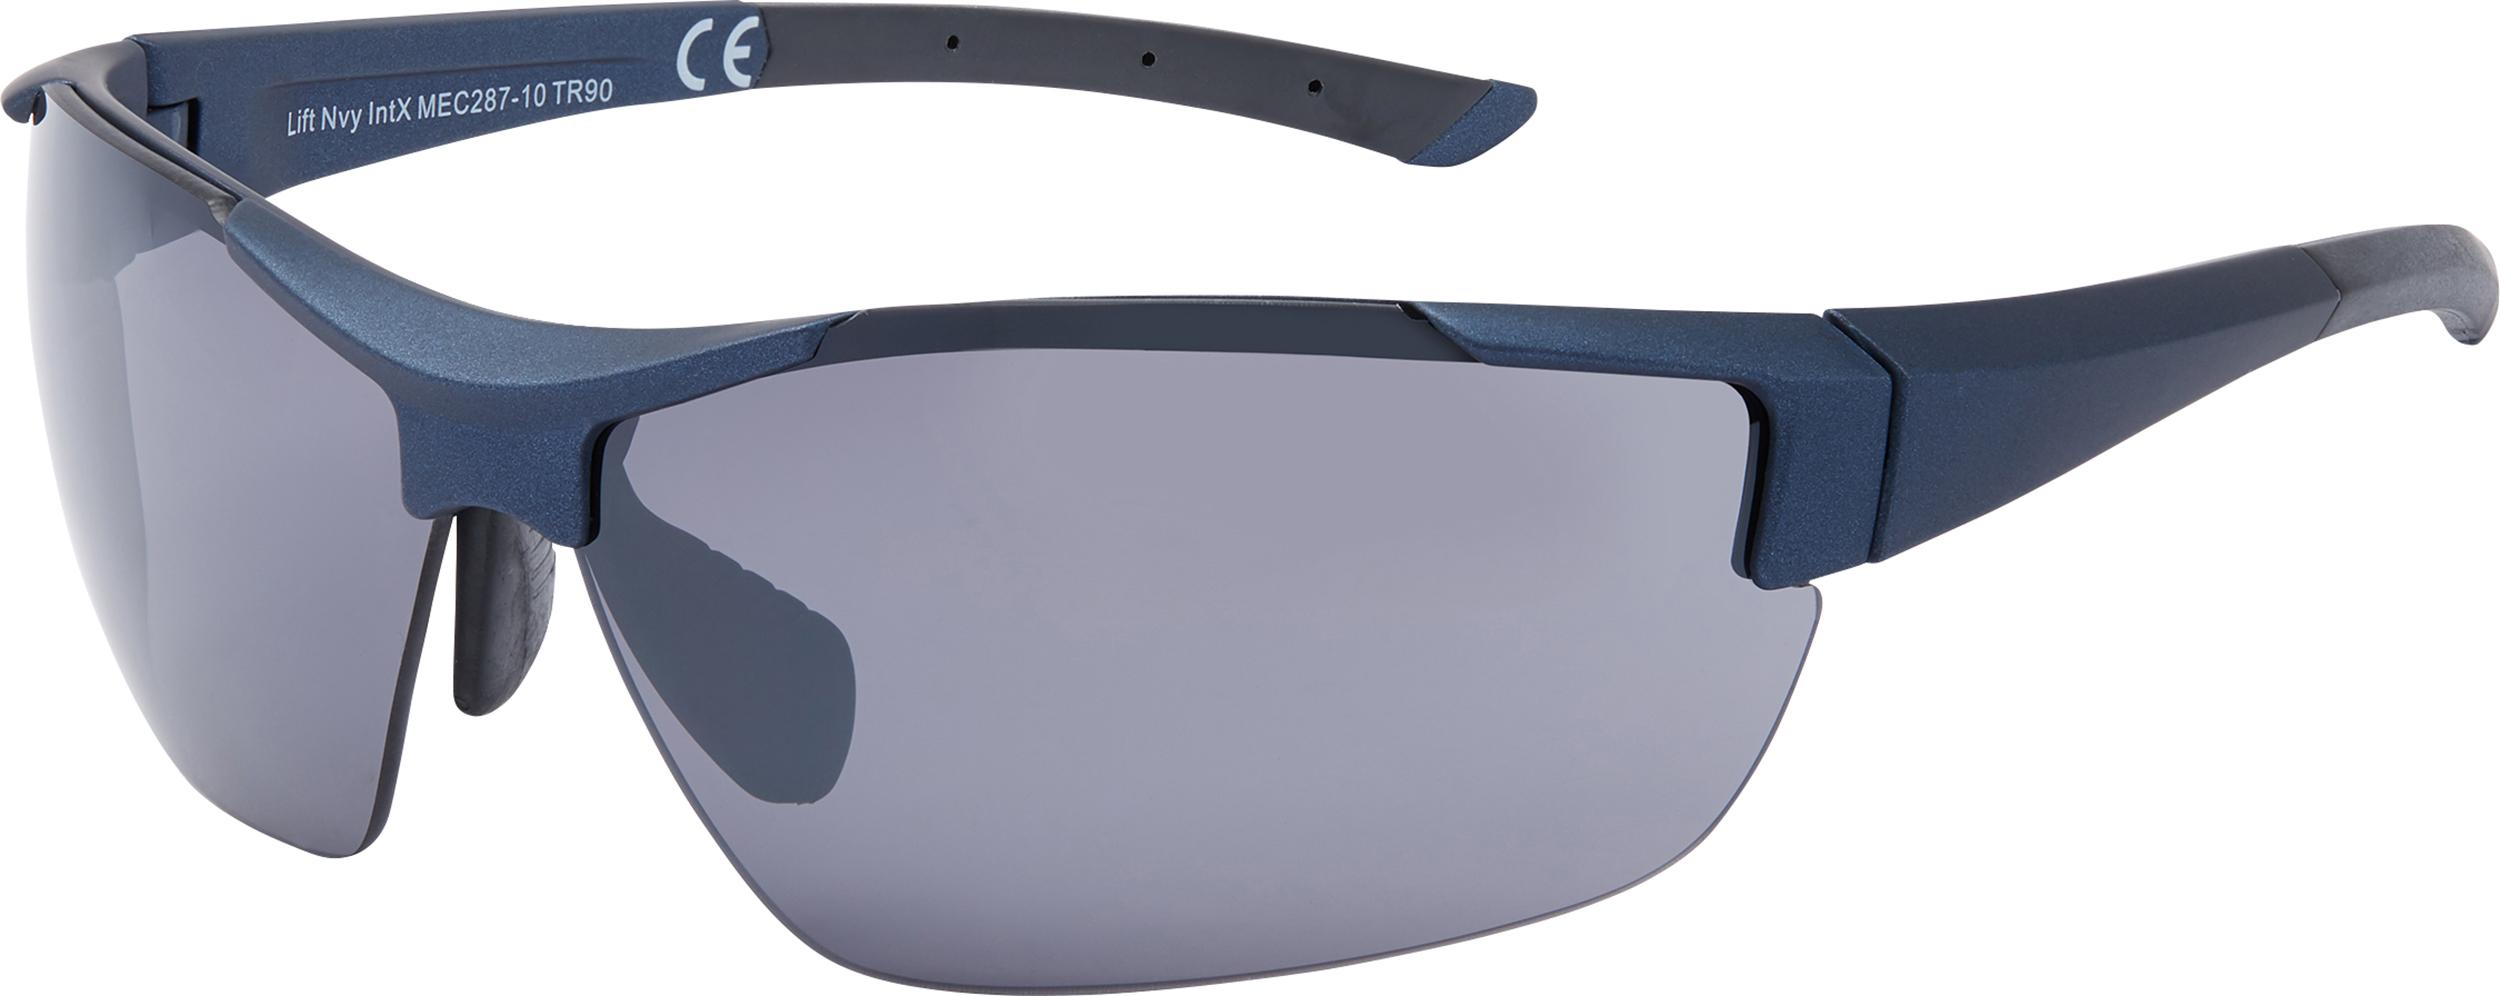 60818b2397 Cycling sunglasses